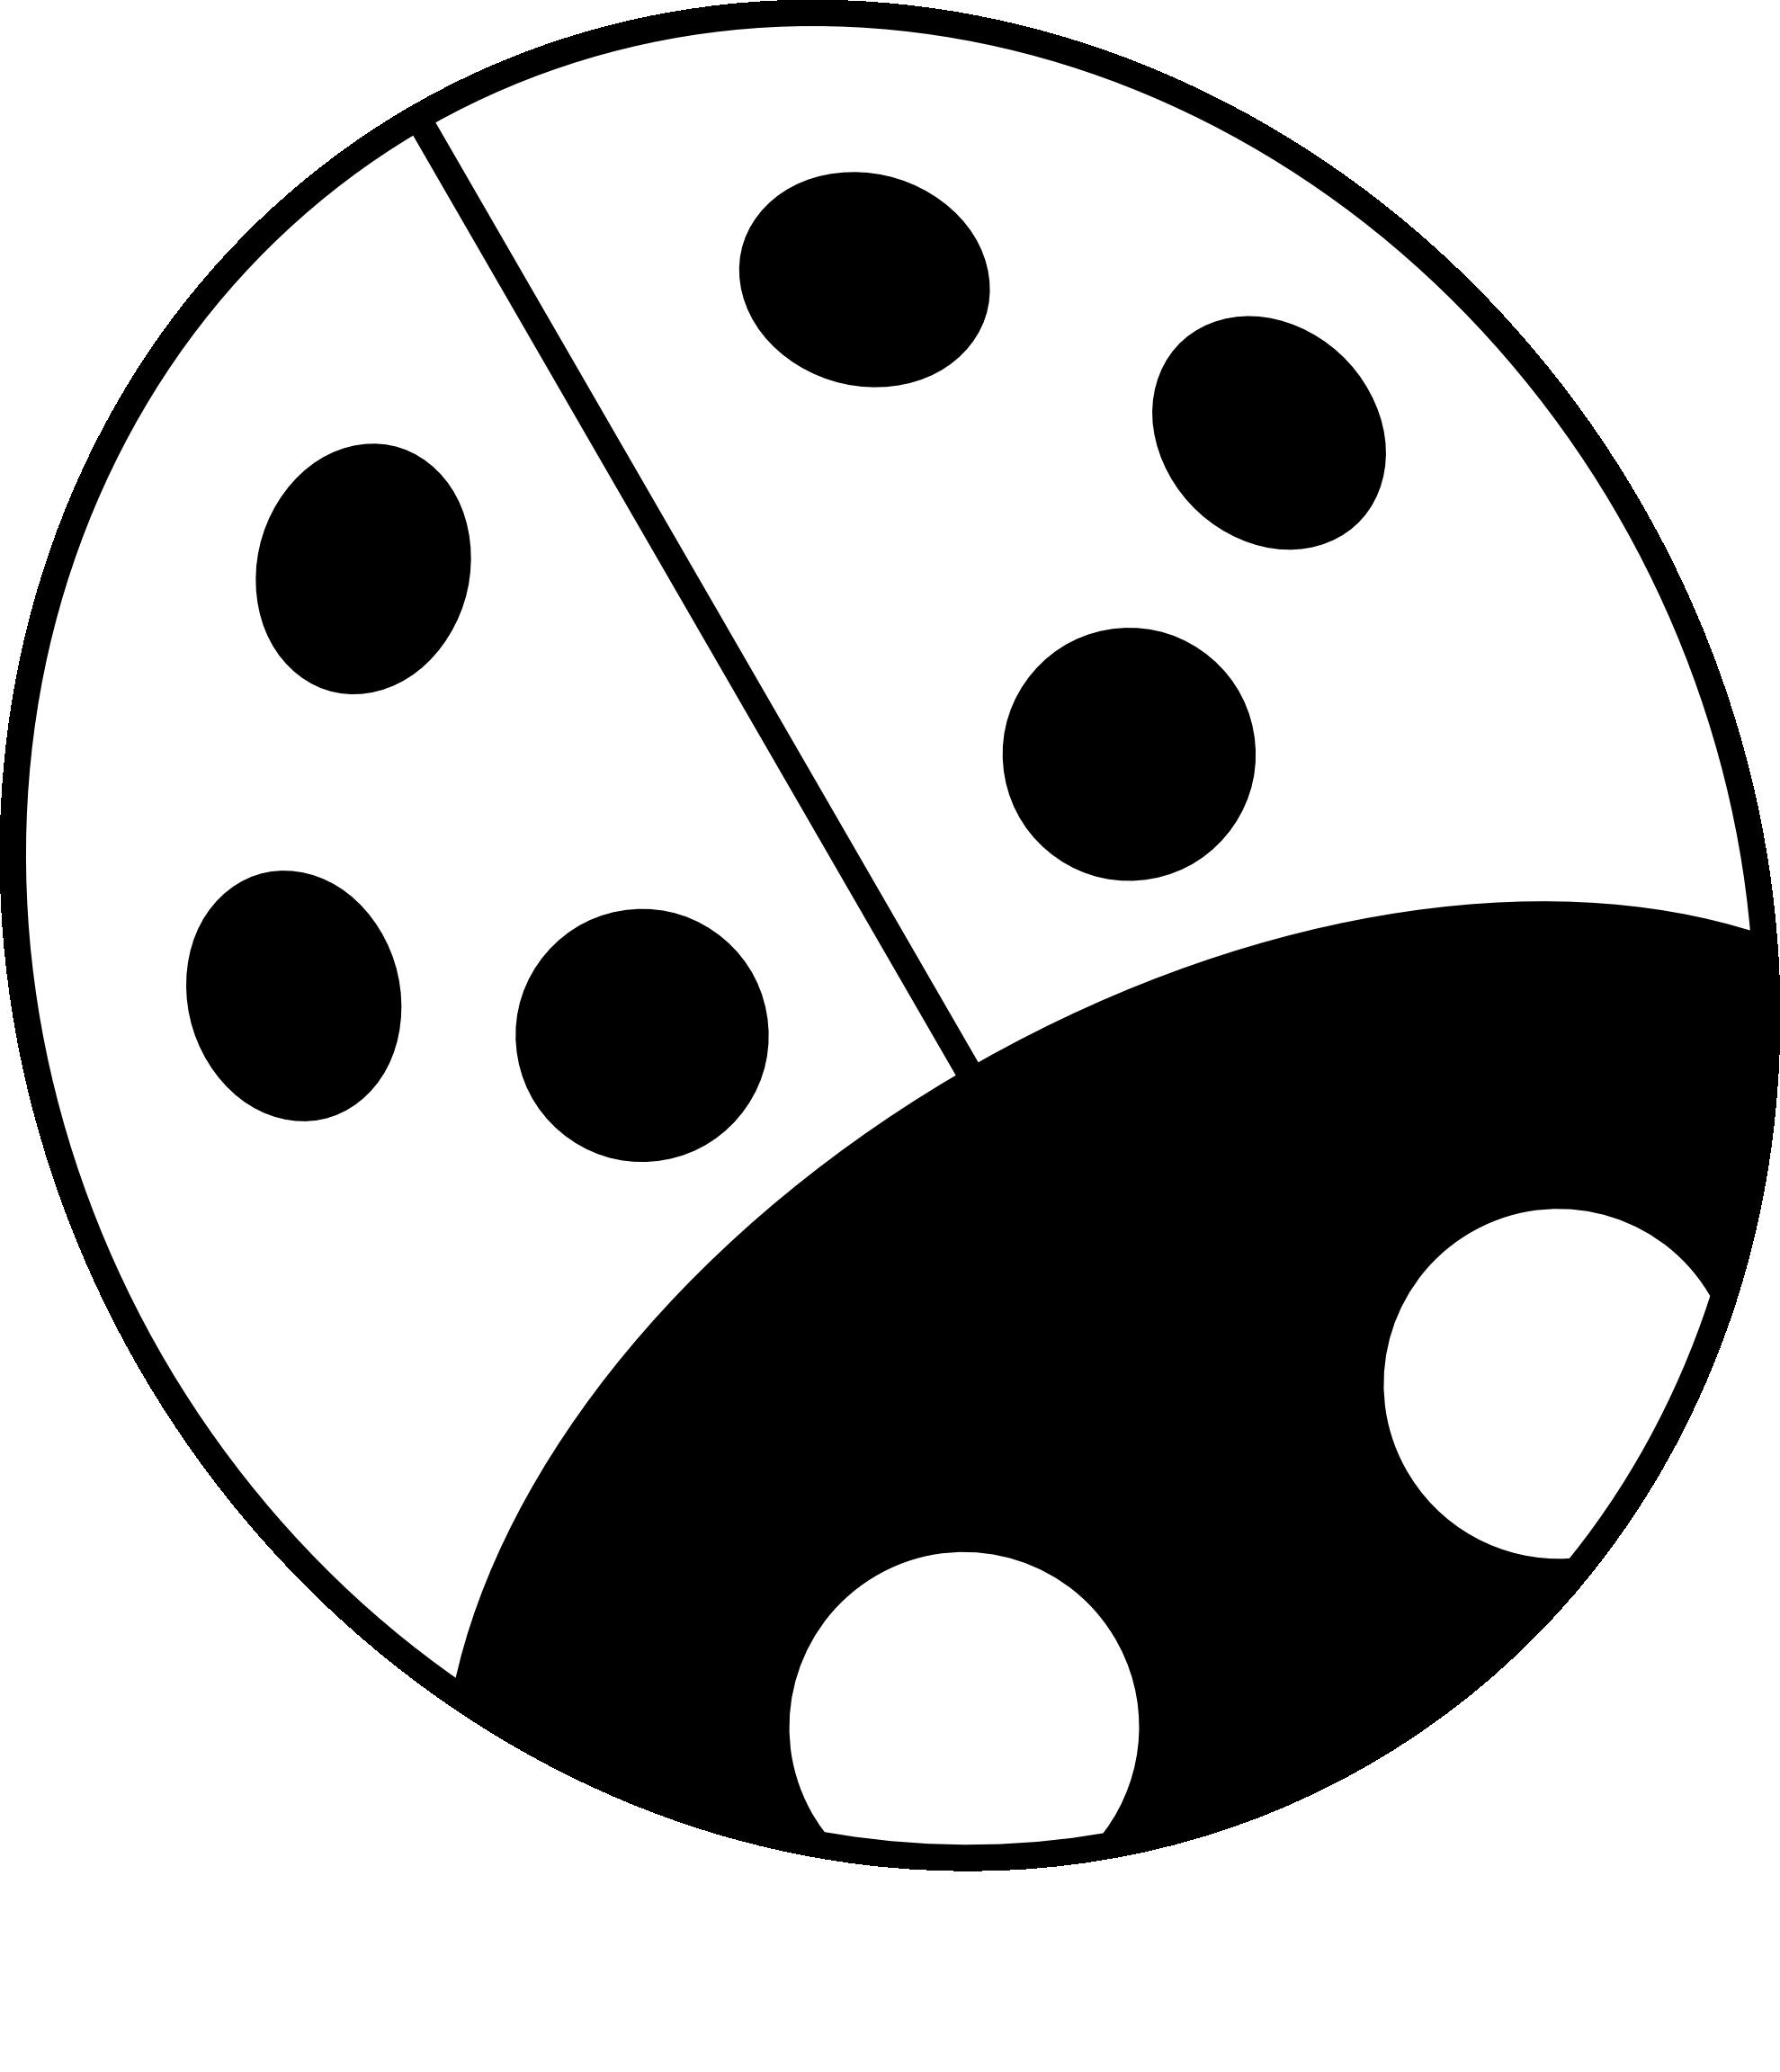 ladybug 12 black white | Clipart Panda - Free Clipart Images: www.clipartpanda.com/clipart_images/ladybug-12-black-white-42529347